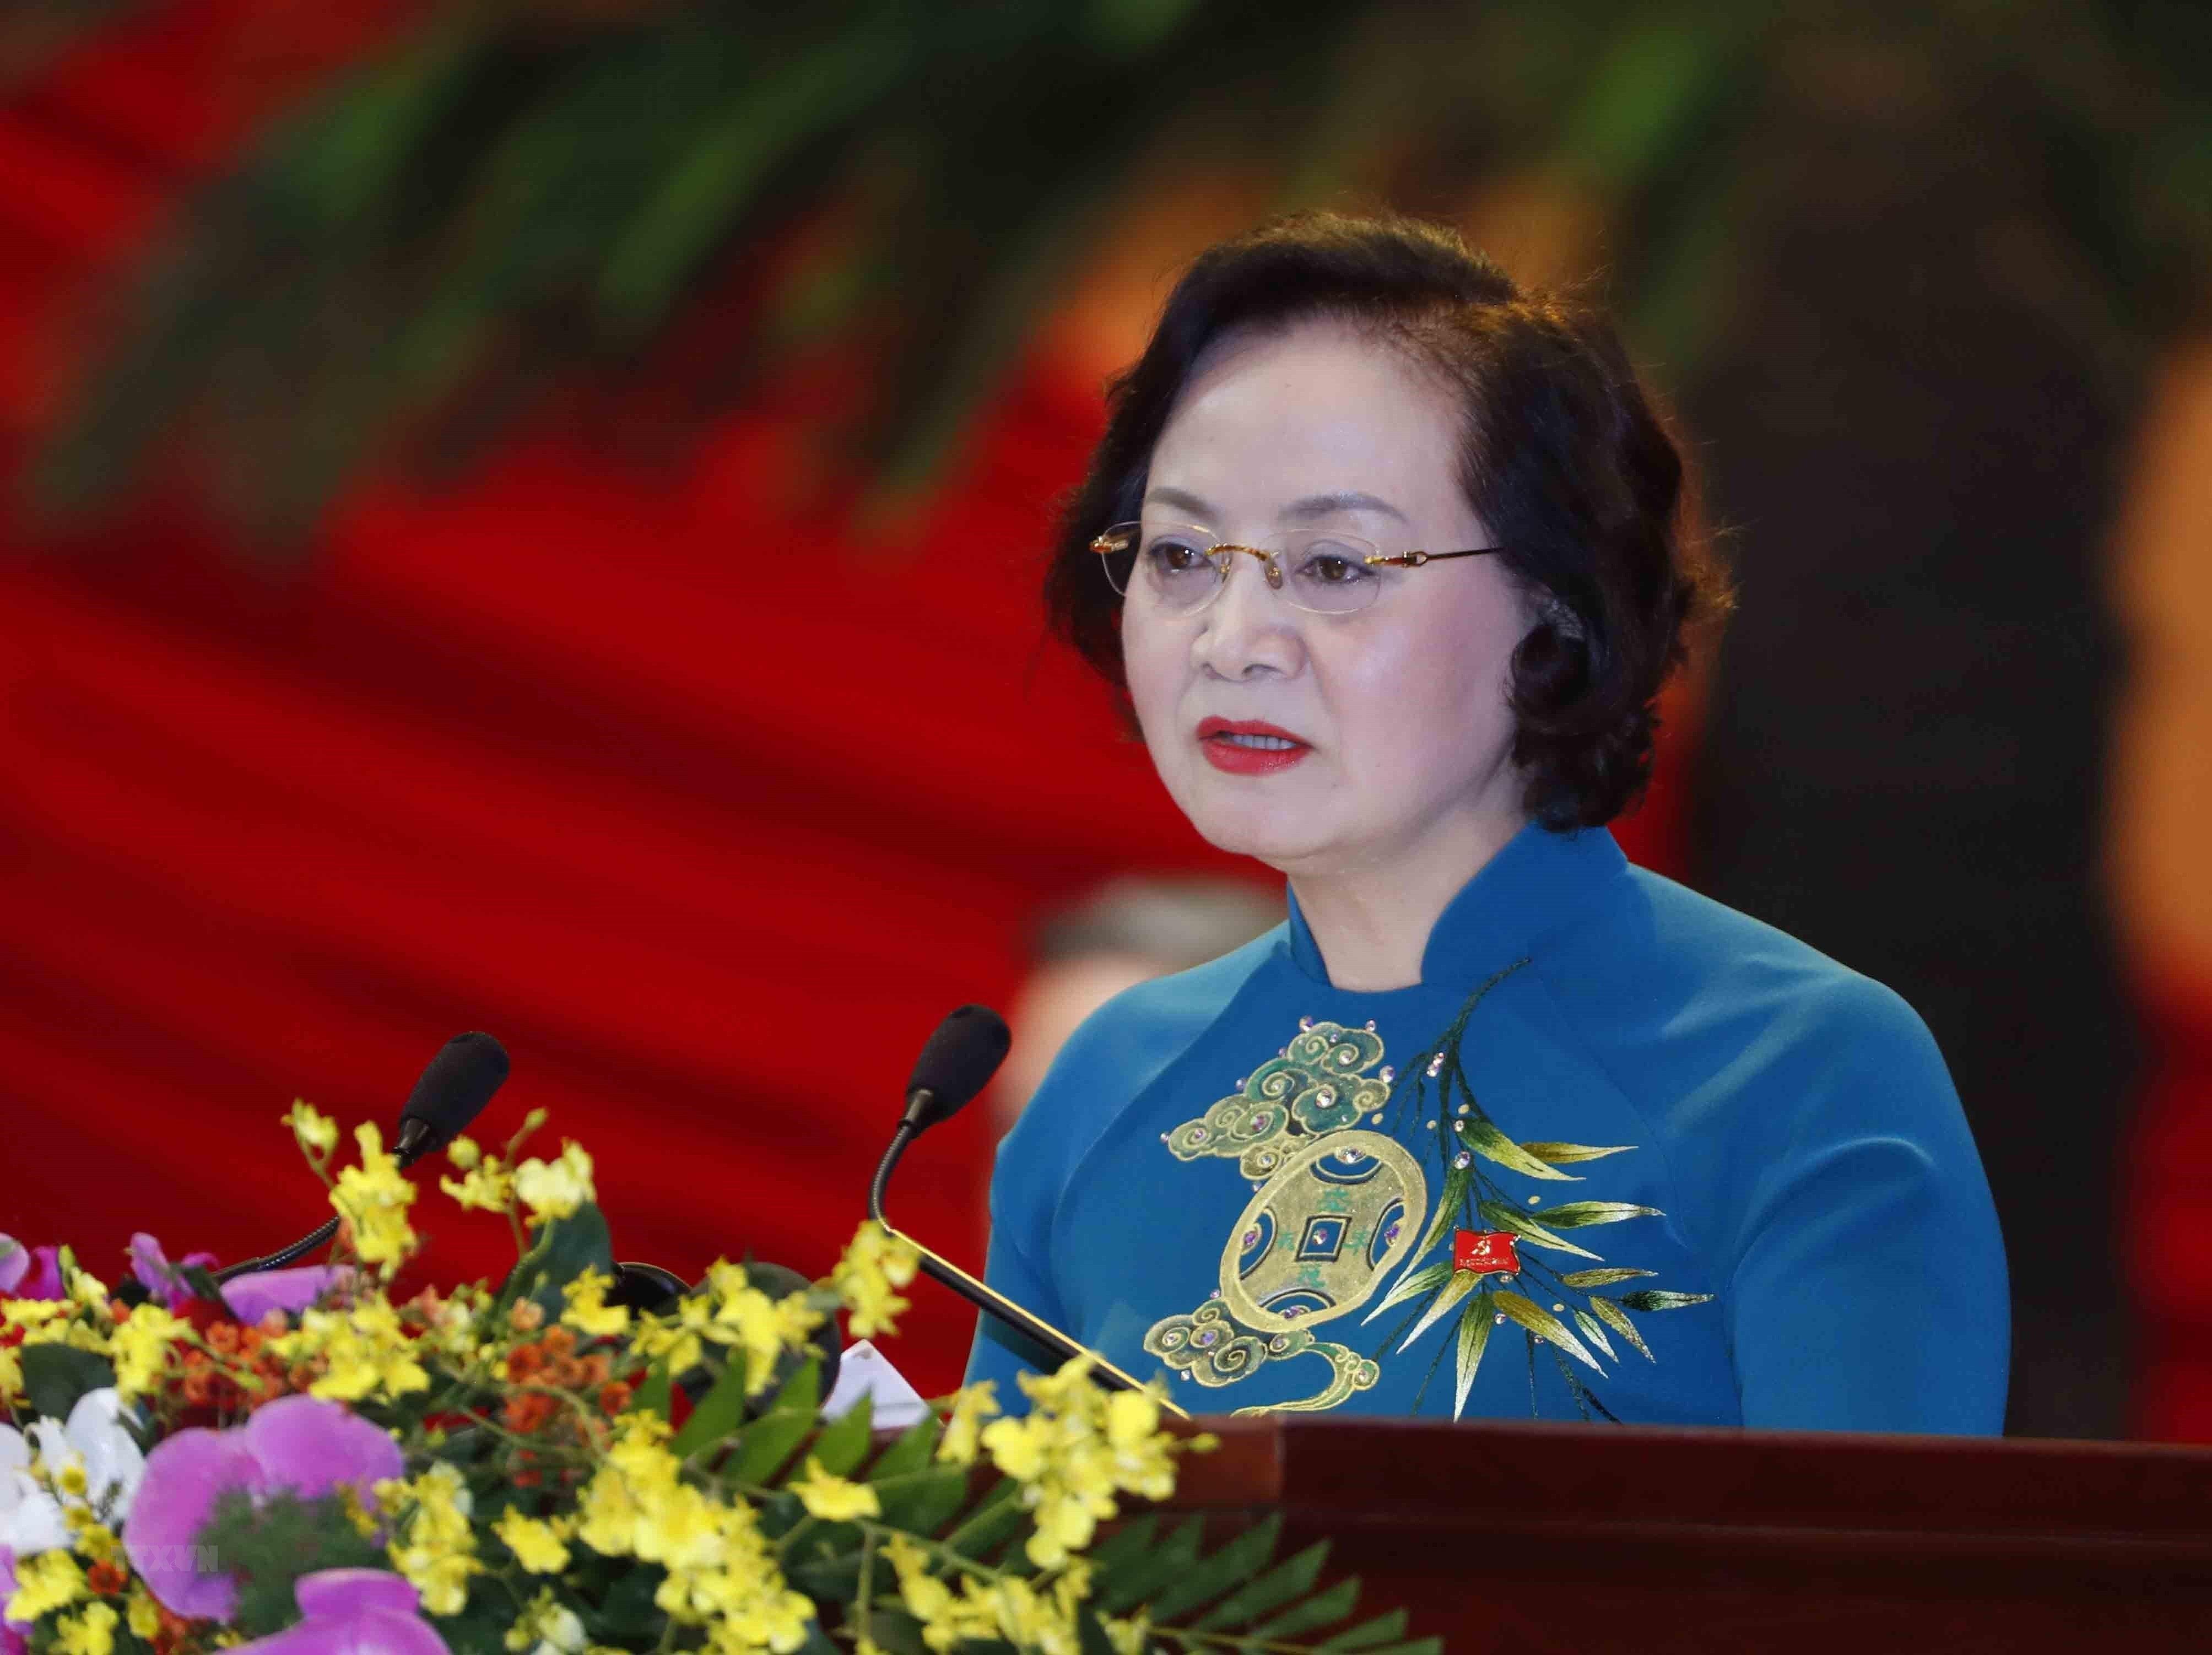 [Photo] Quang canh phien thao luan cac van kien Dai hoi XIII cua Dang hinh anh 33